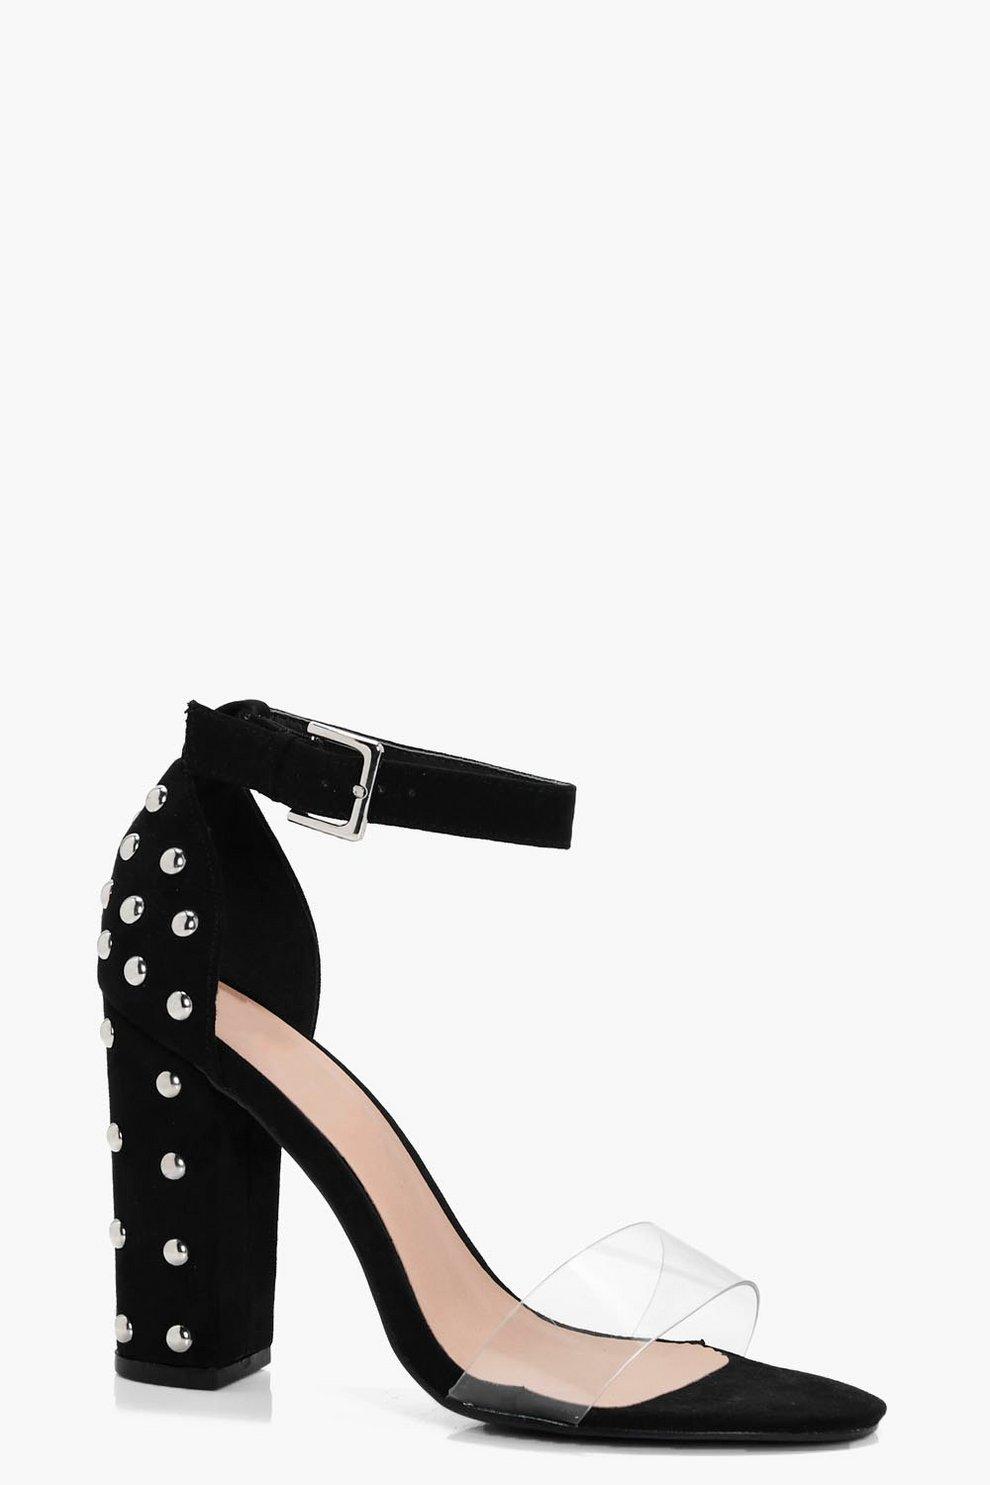 Alice Stud Detail Heel 2 Parts USXtsqR